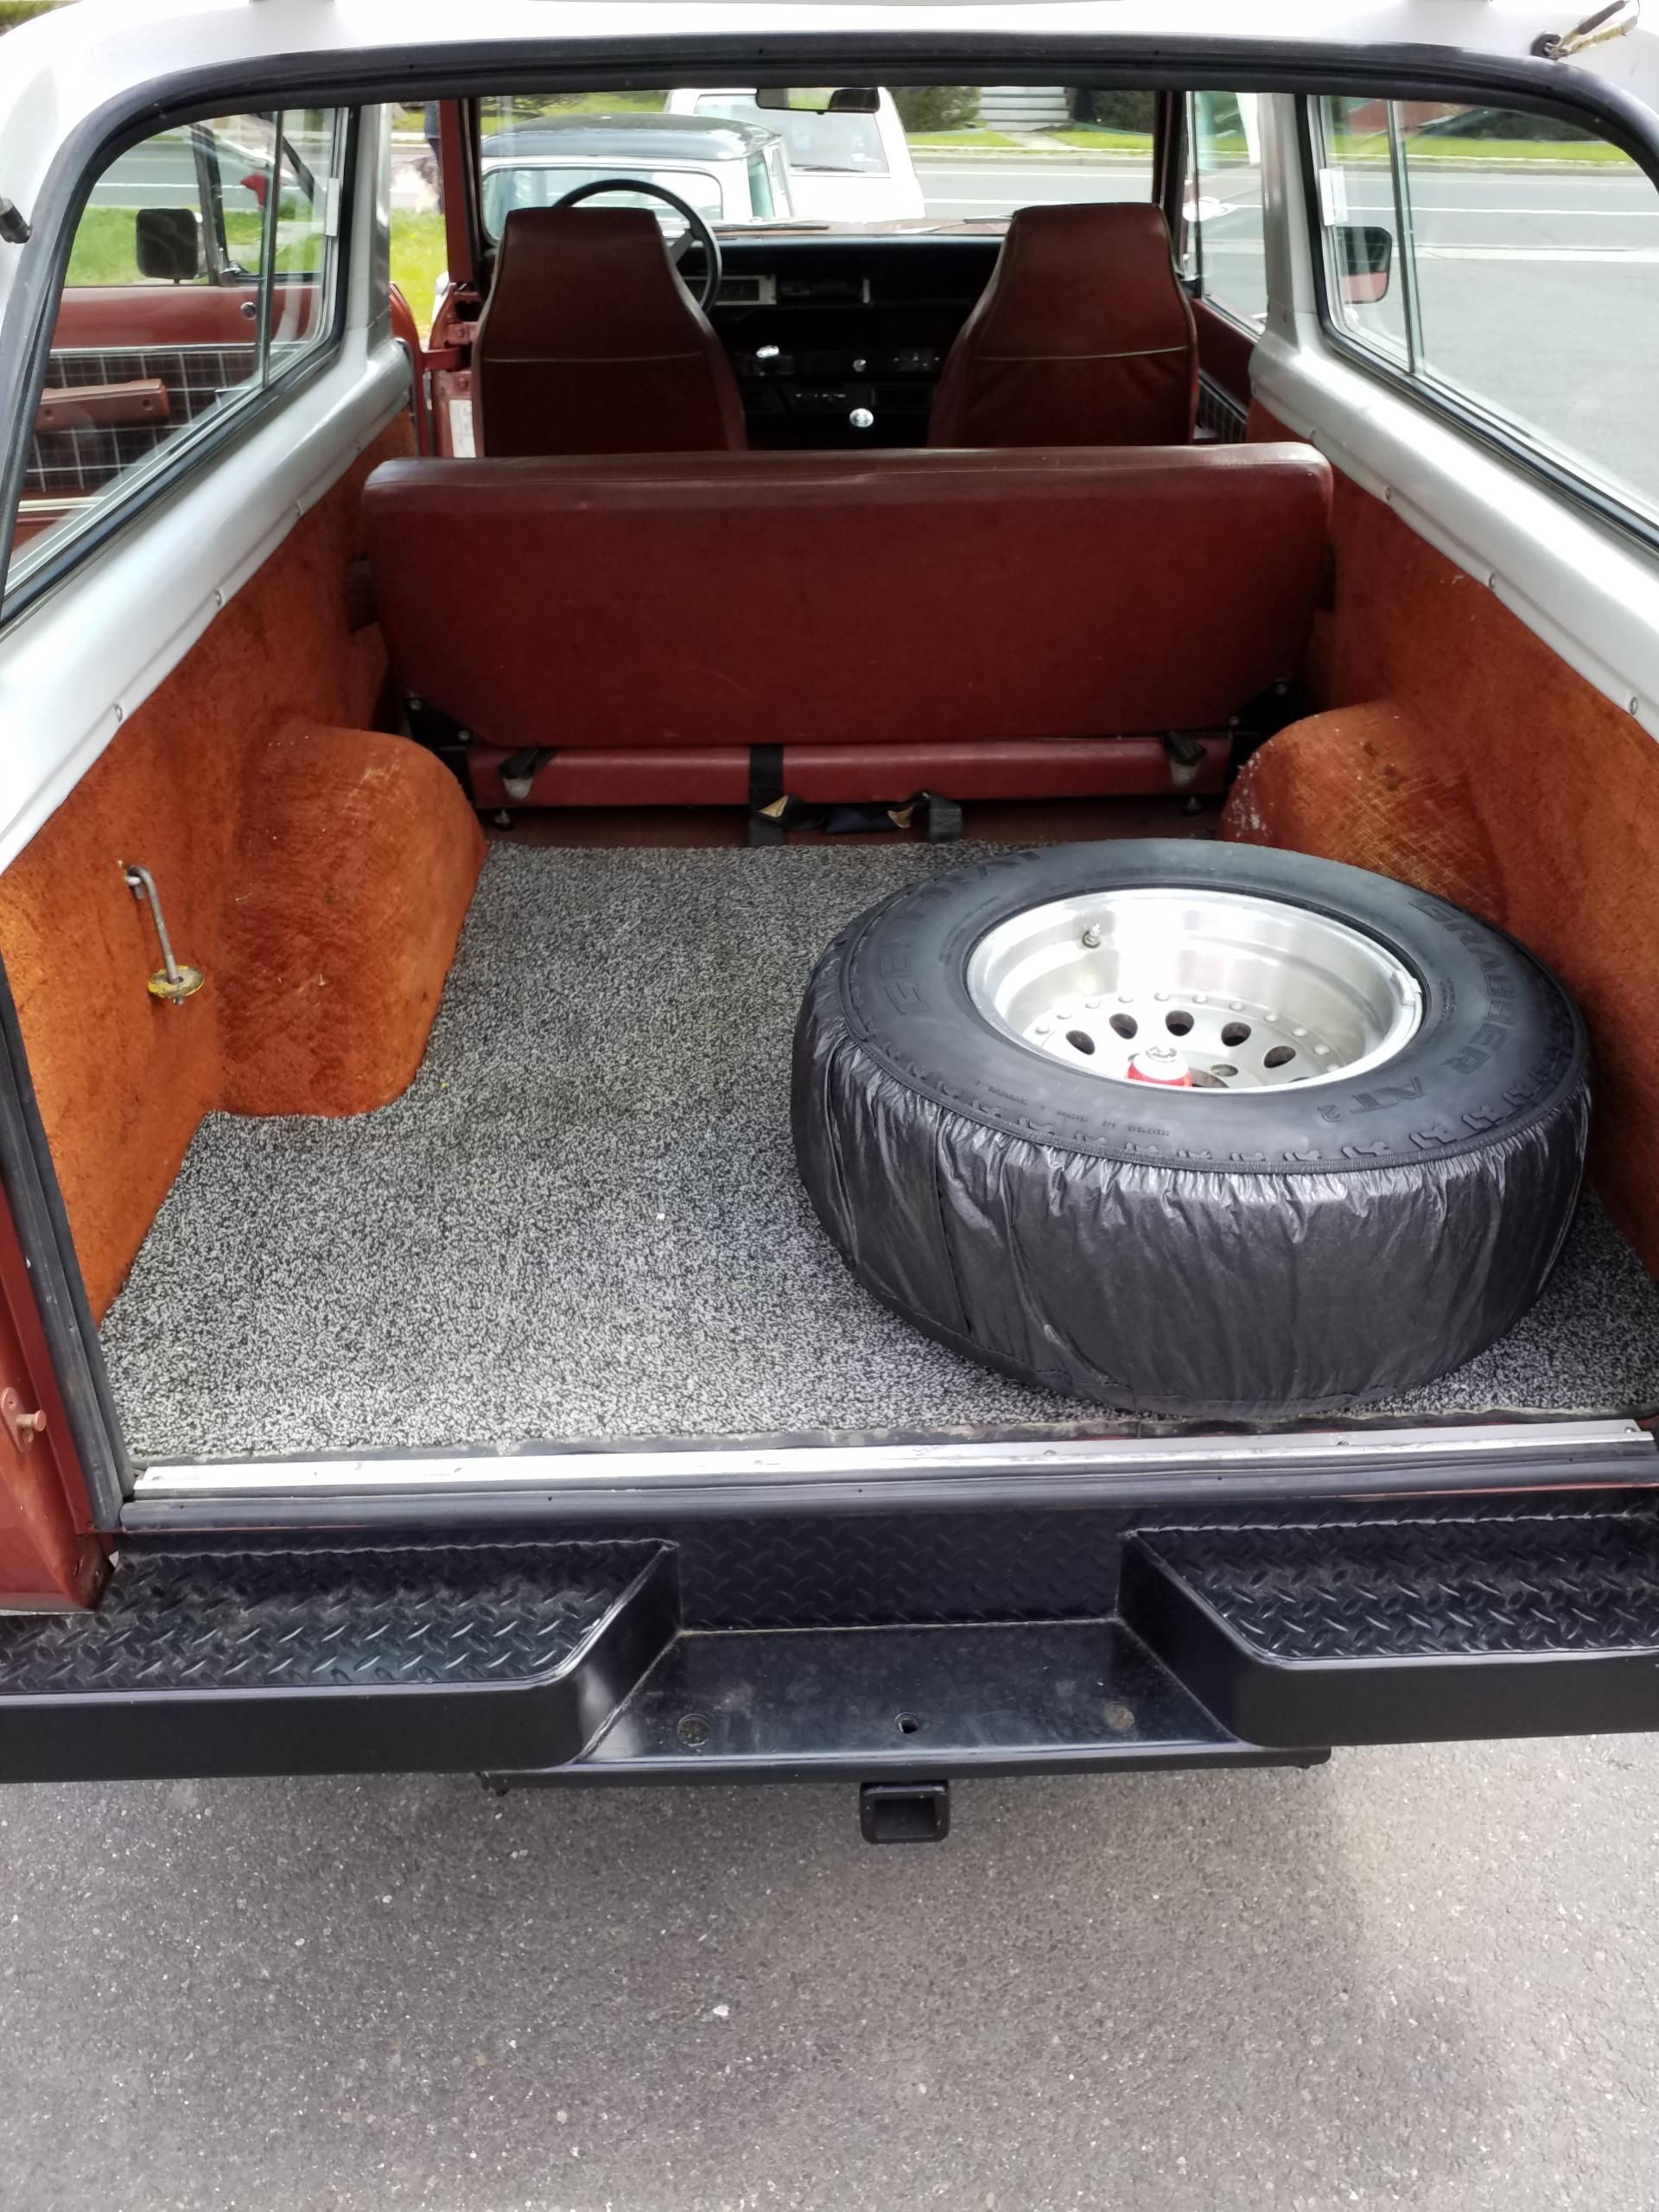 Used-1980-International-Harvester-Scout-II---Rallye